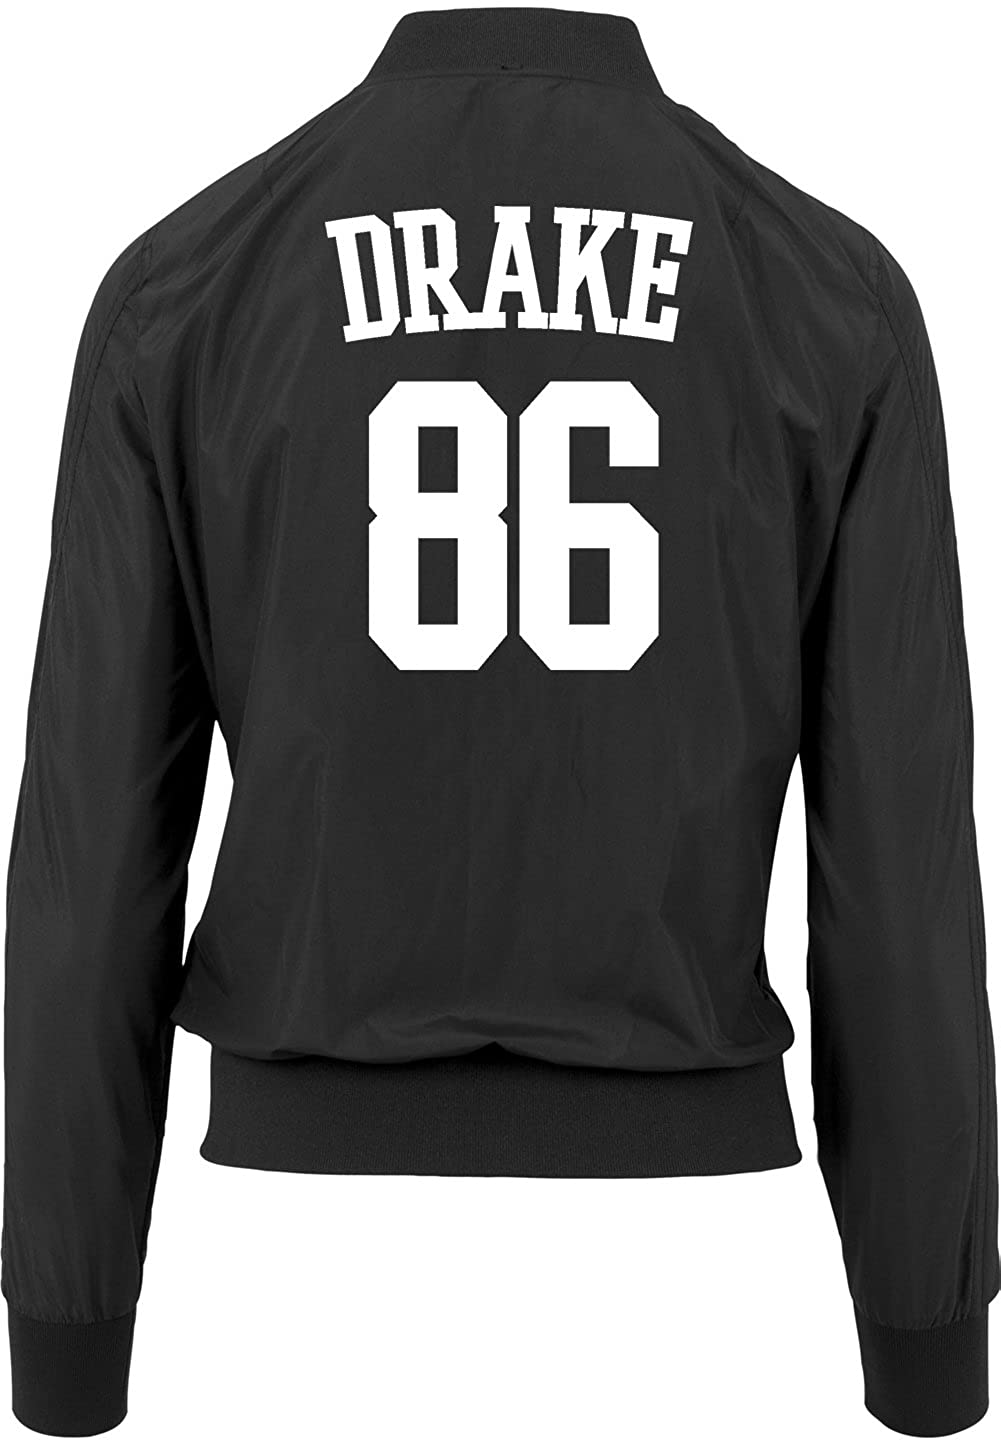 Freak Ropa 86 Bomber Drake Accesorios Girls Chaqueta Negro Y Amazon Certified es xz1qOYOT